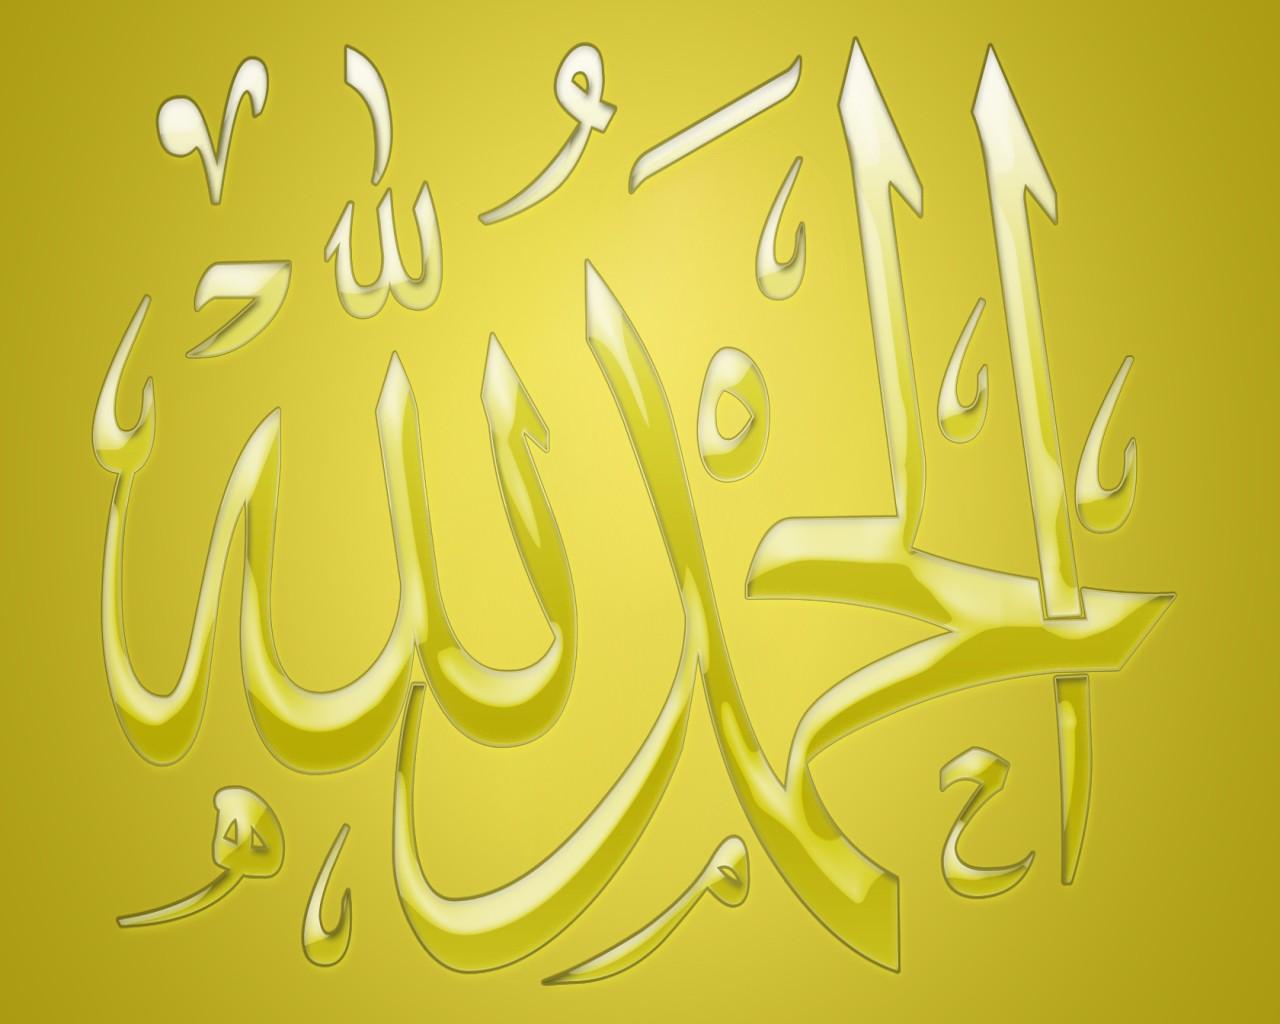 Islamic Calligraphy Wallpapers Yasir Imran Mirza